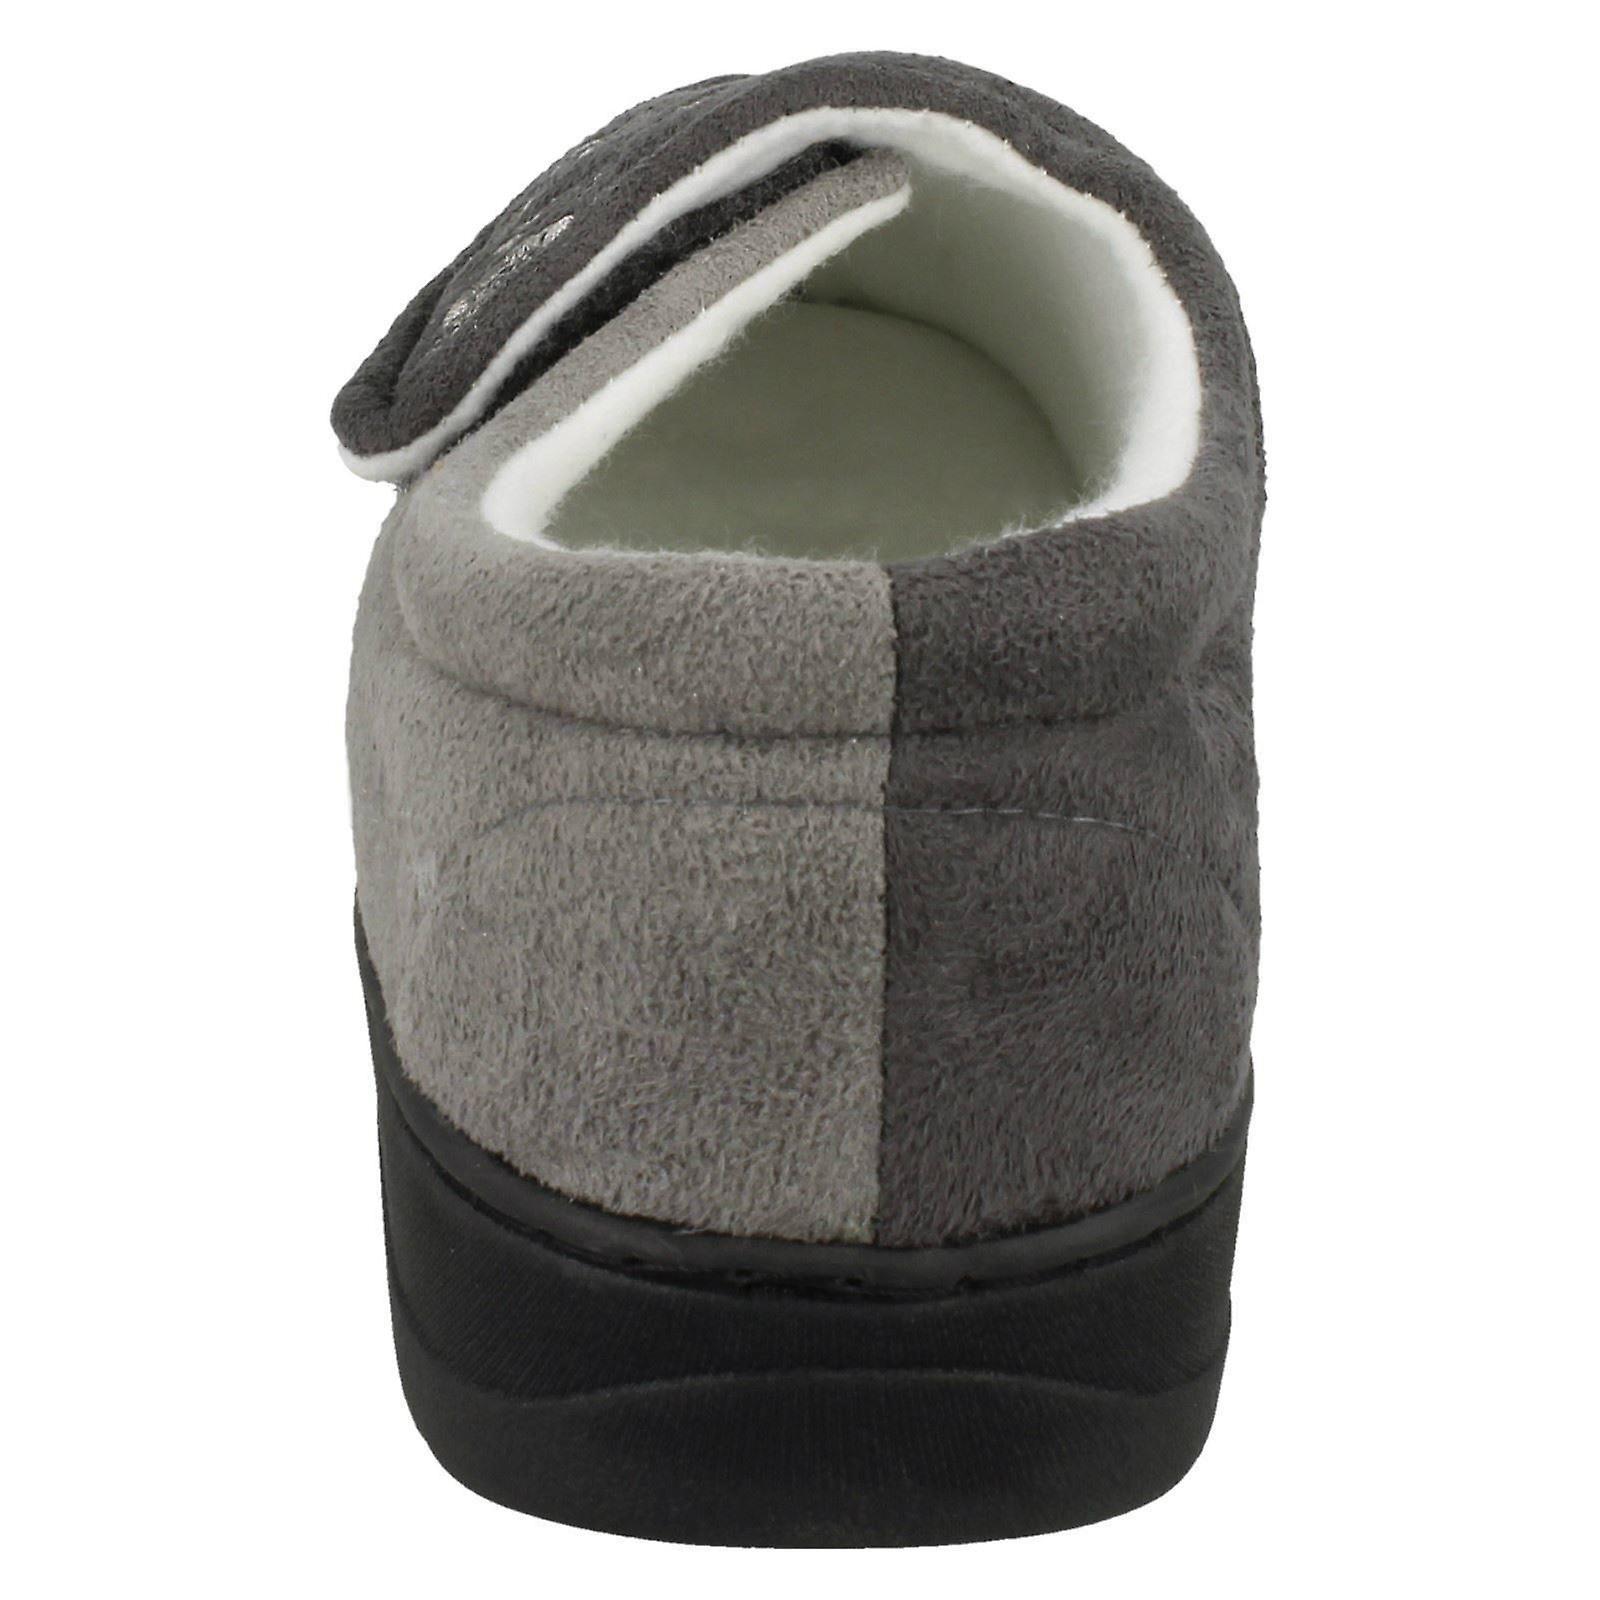 Jyoti Dames Brodé Pantoufles Julie W15-191 - Dark Grey/light Grey Textile Uk Taille 5 Ue 37,5 Us 7